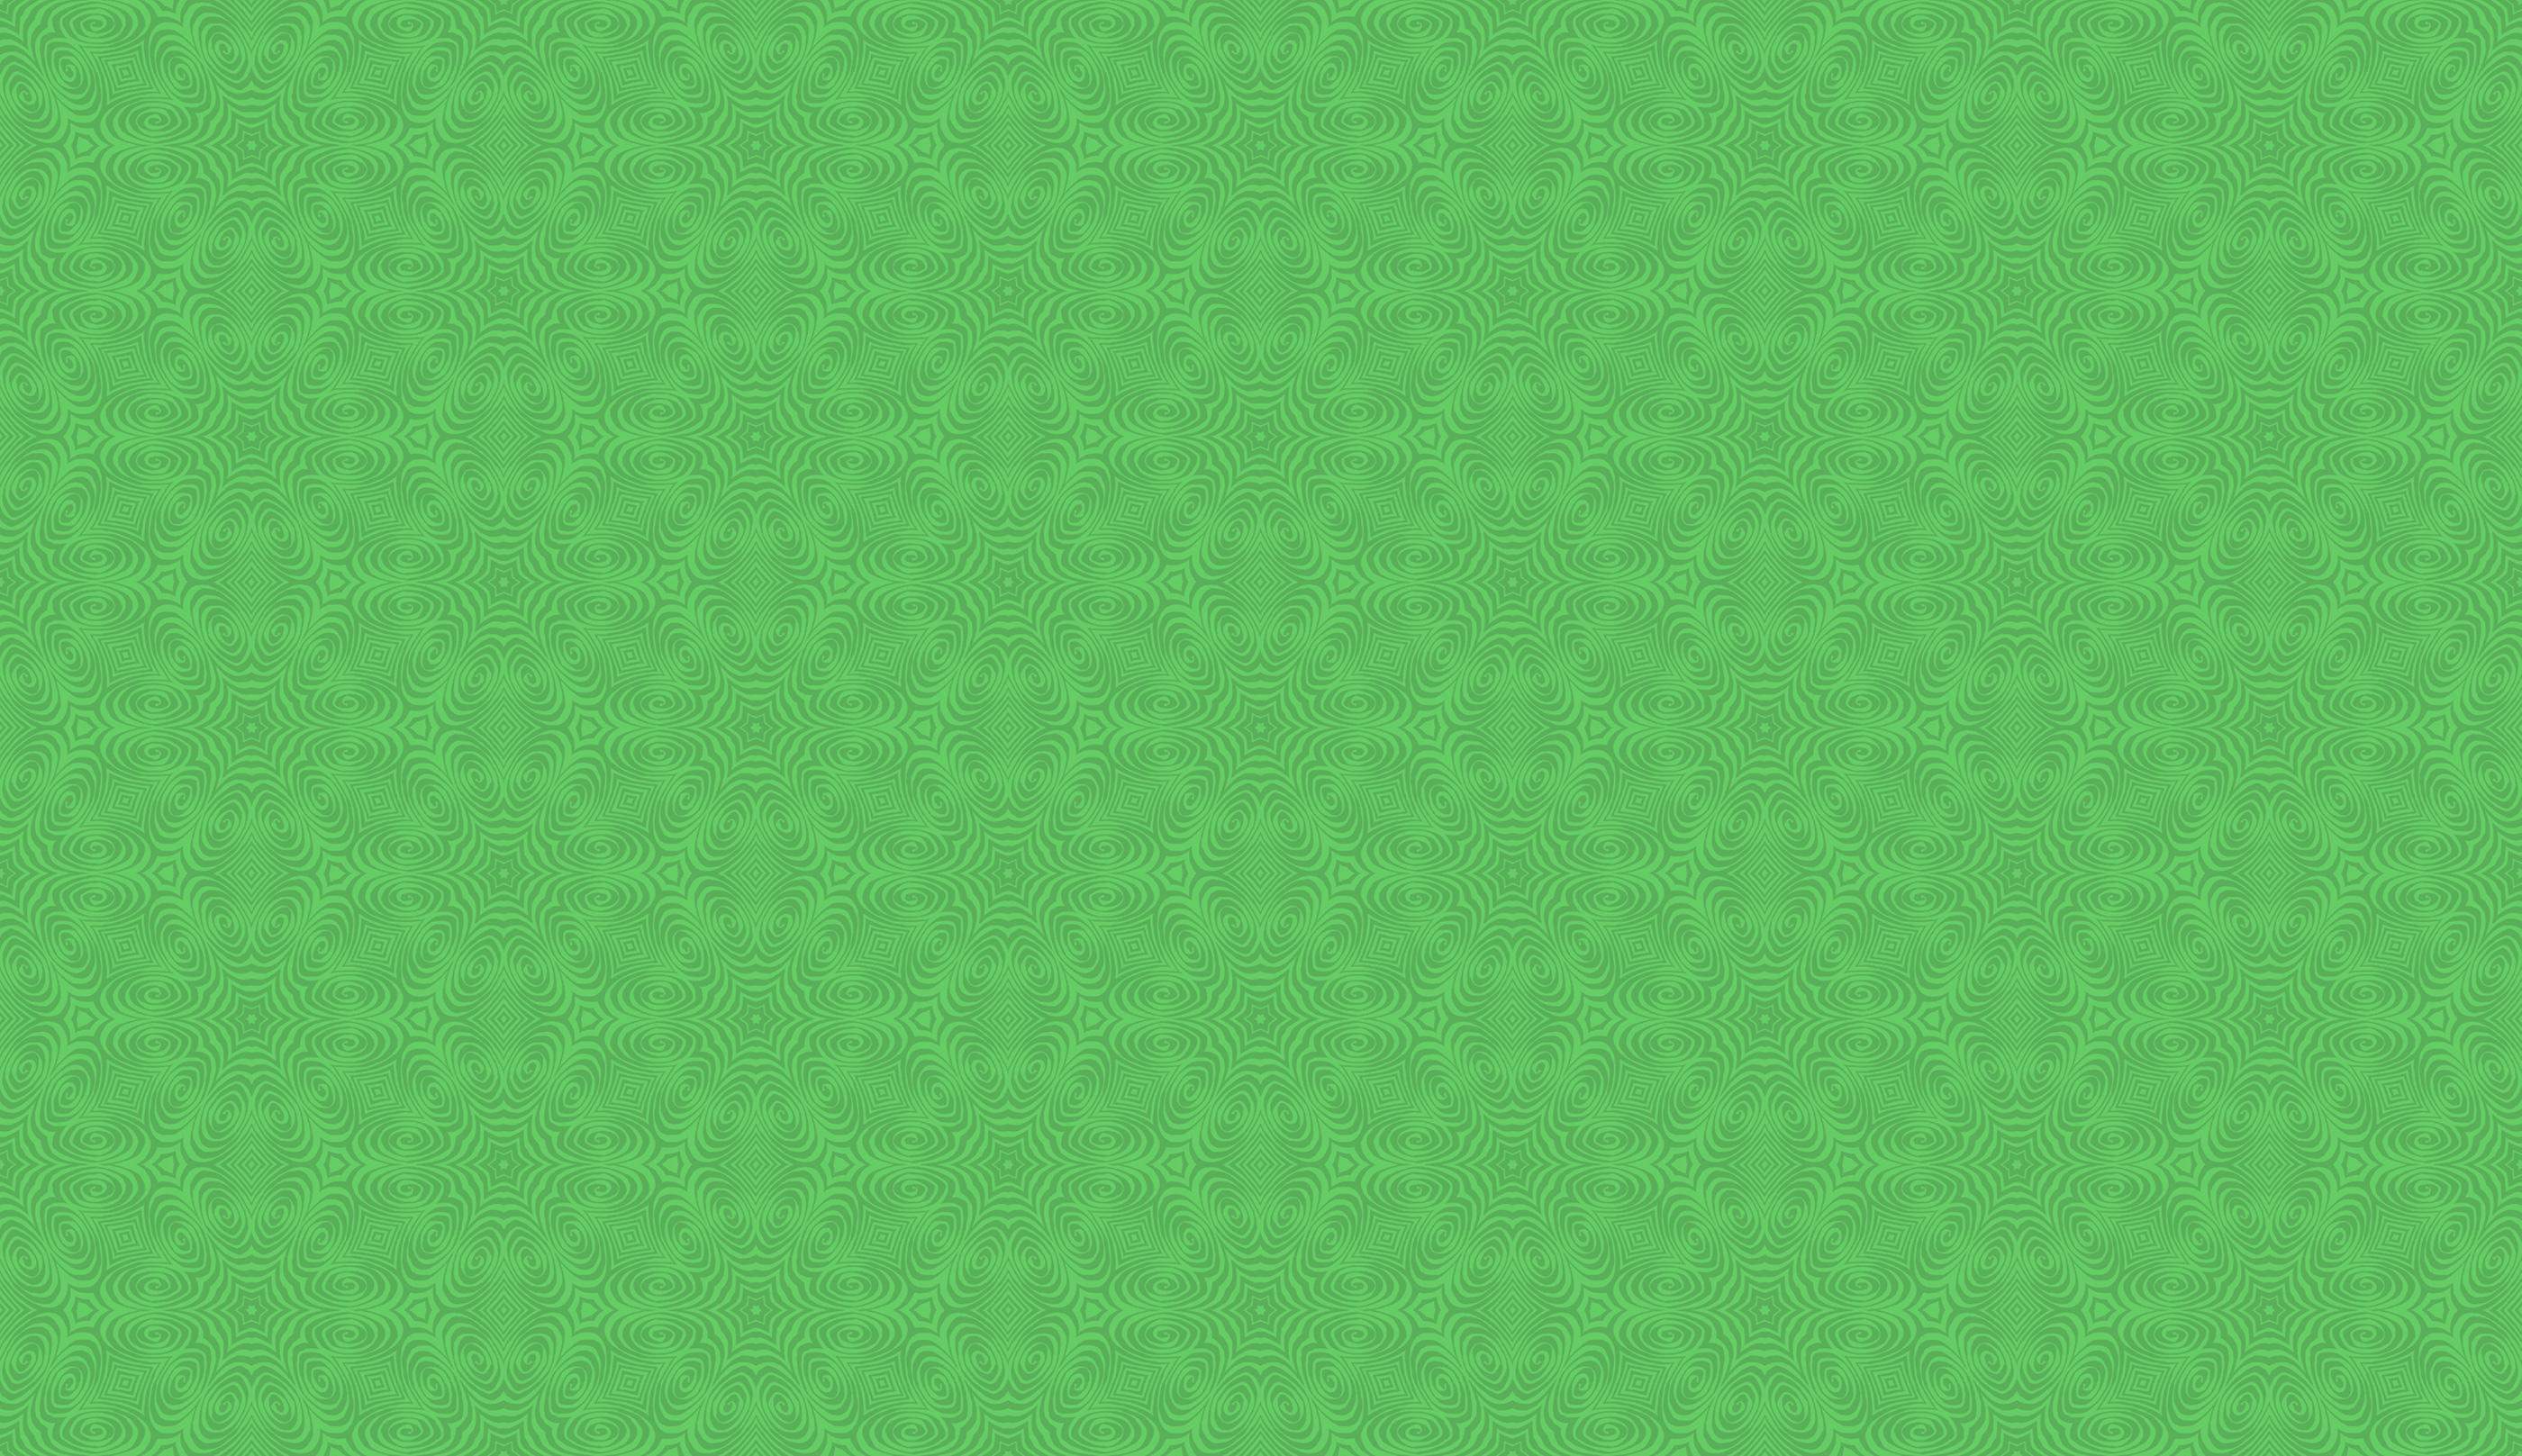 Spiral Calligraphic Green Background Pattern